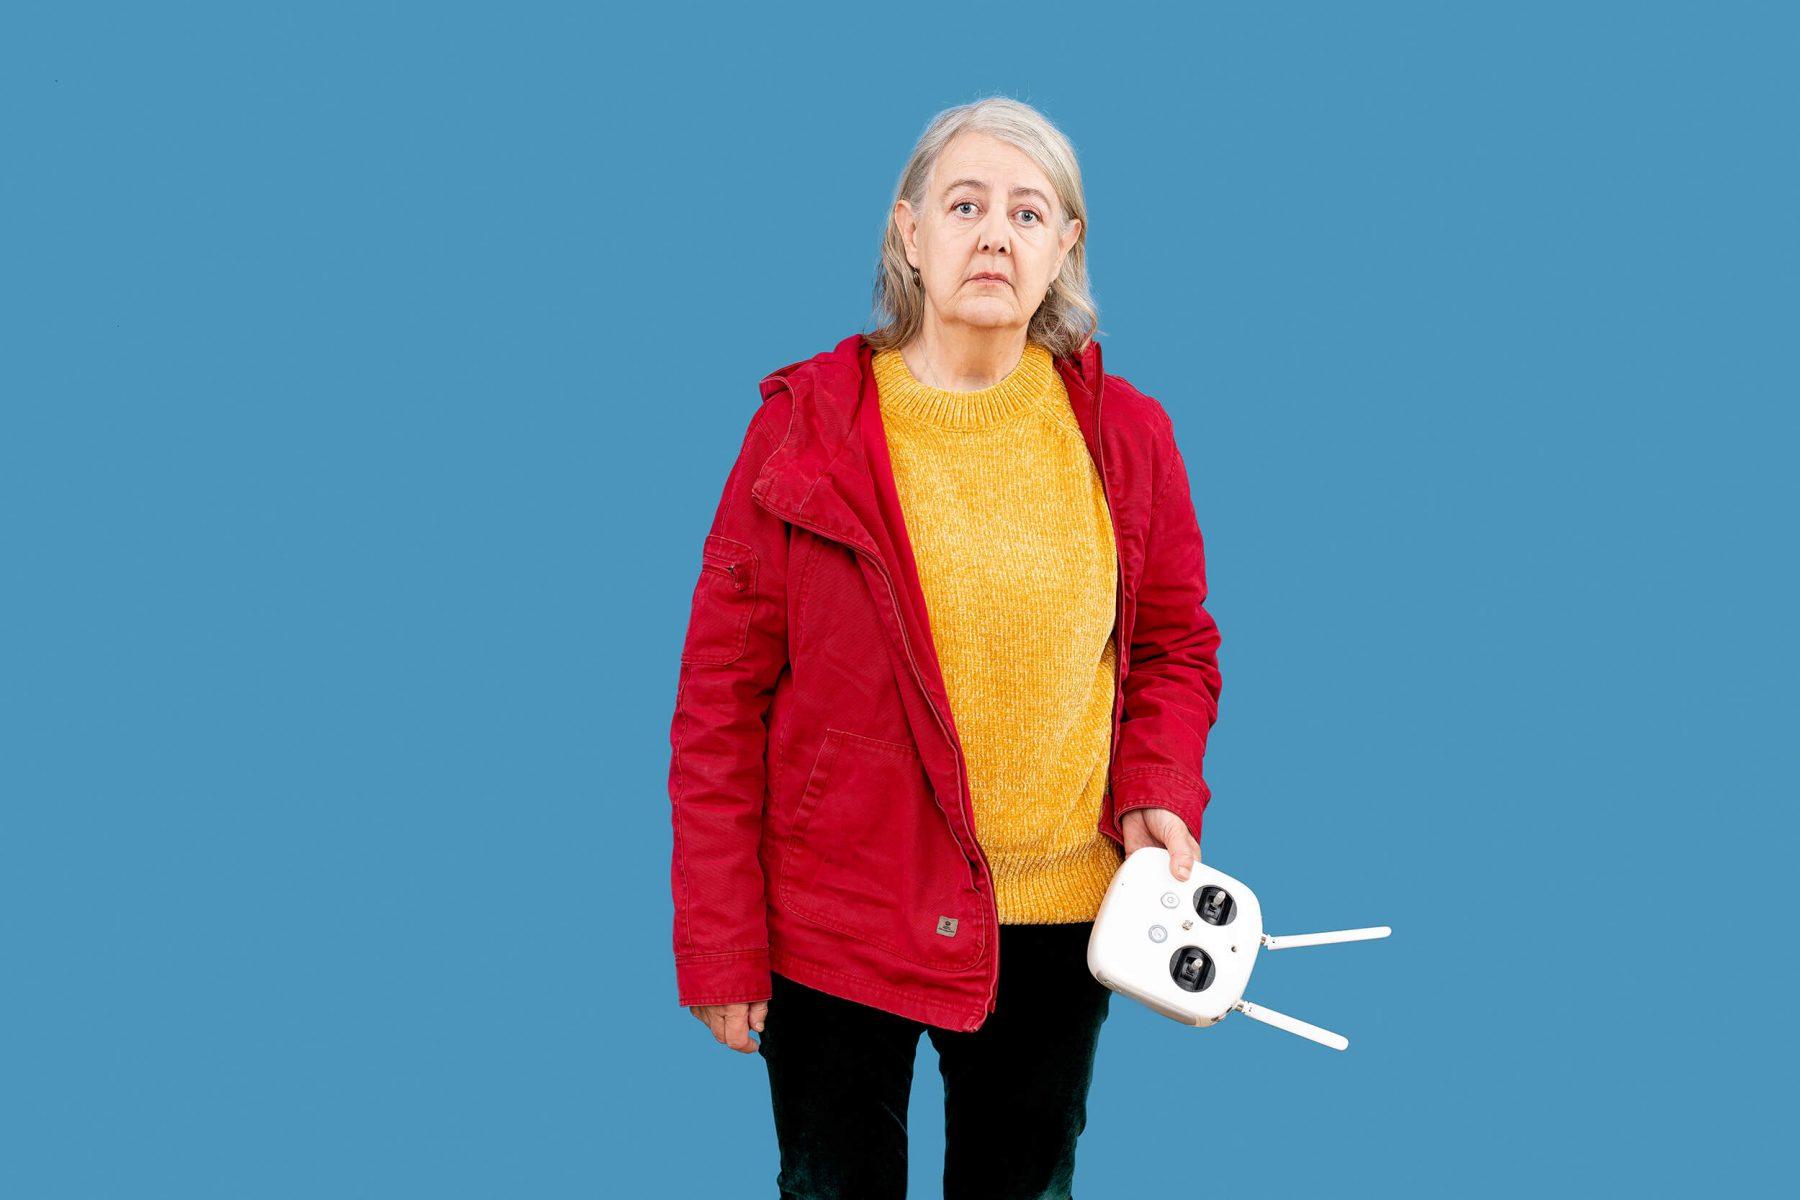 Sad woman in studio. Crashed a drone.